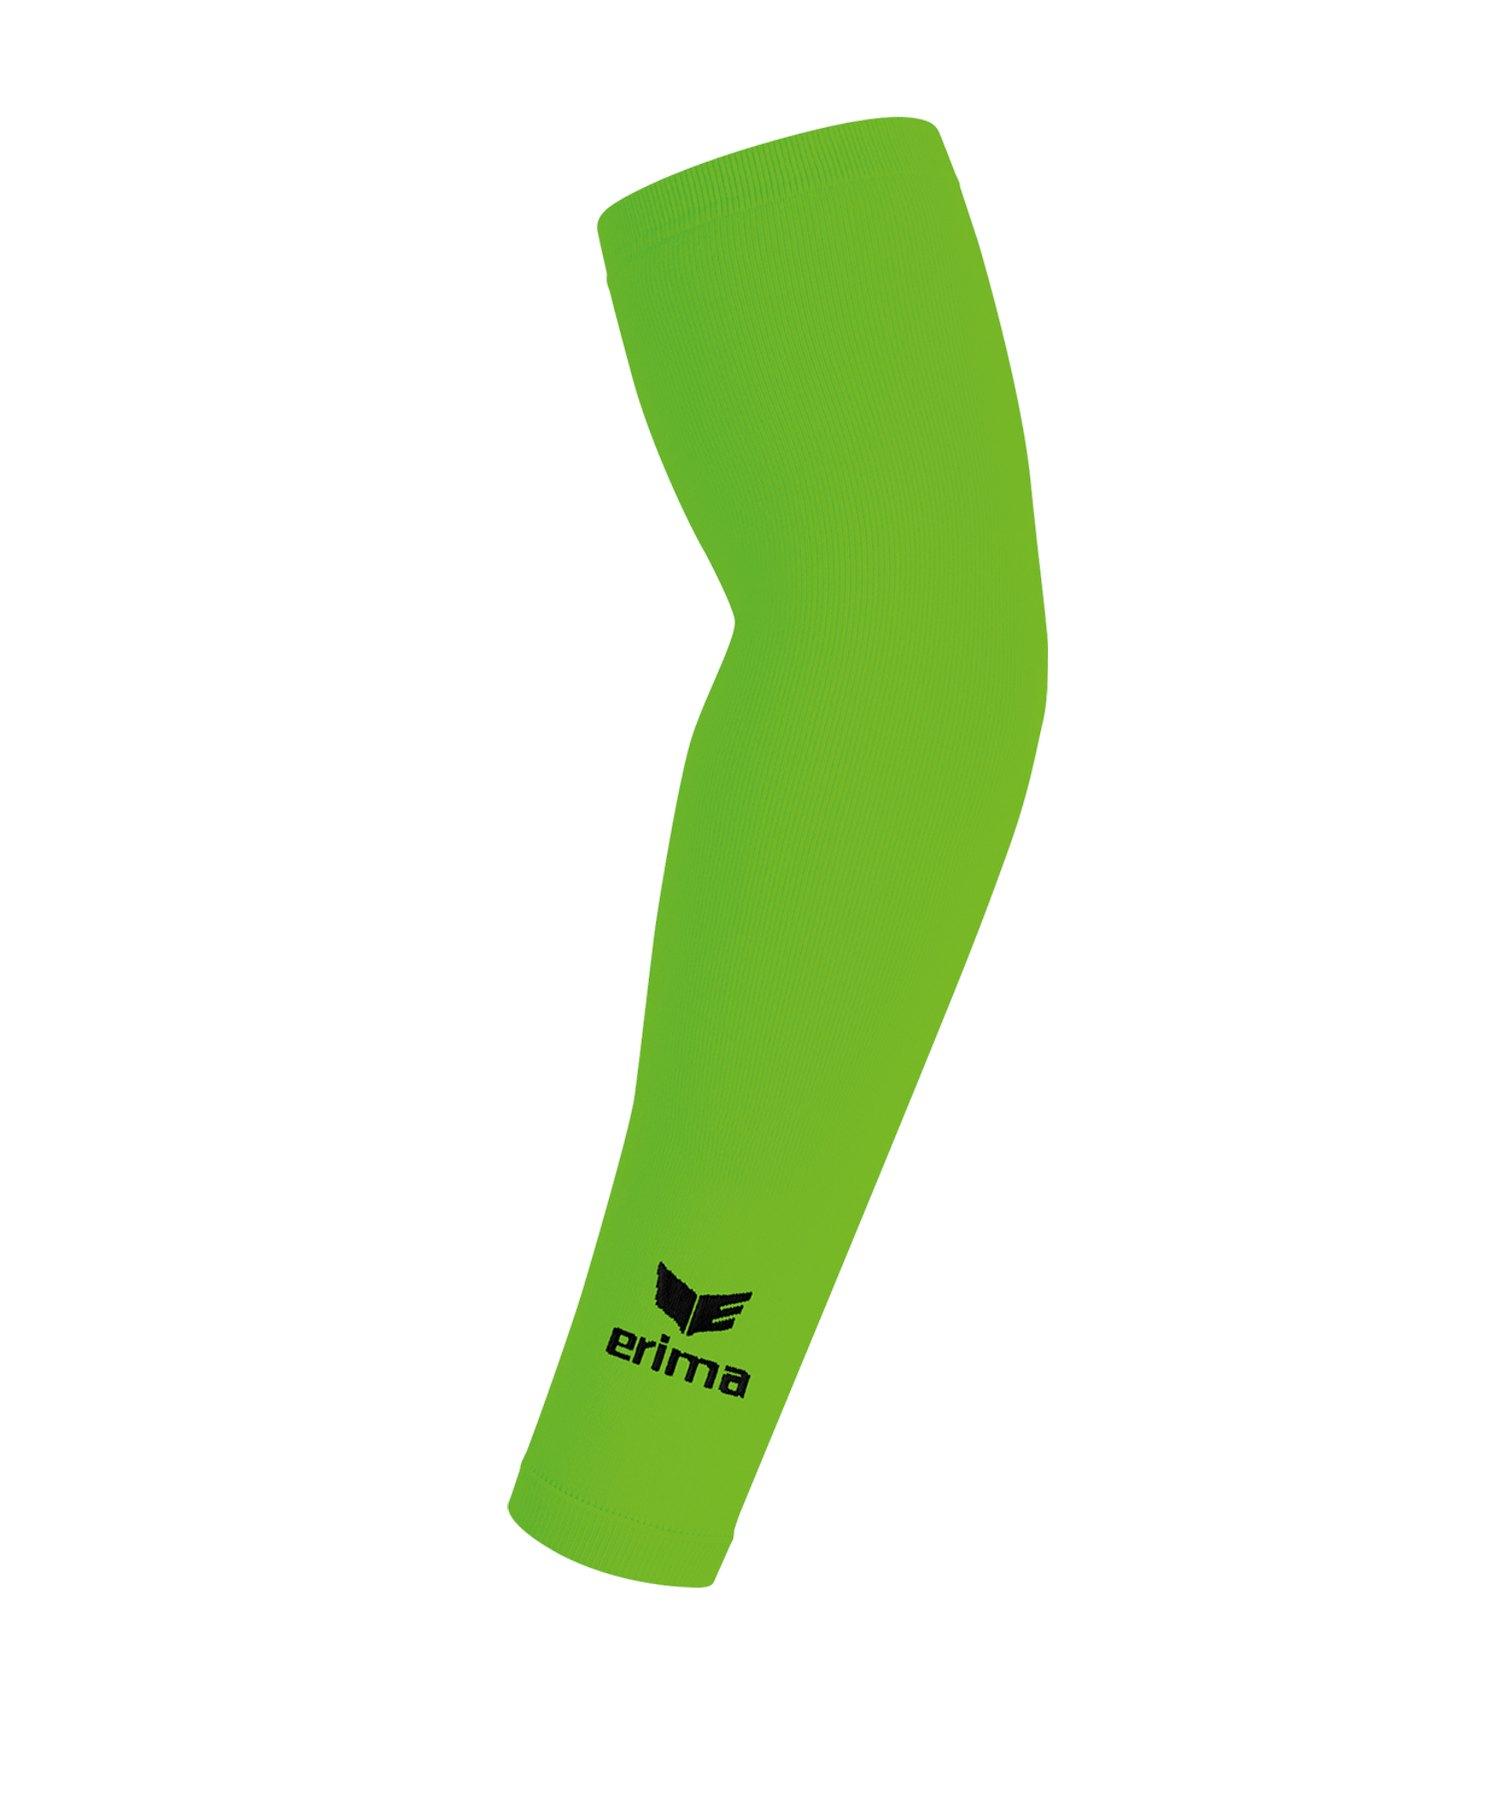 Erima Armsleeves Armstulpen Grün - gruen